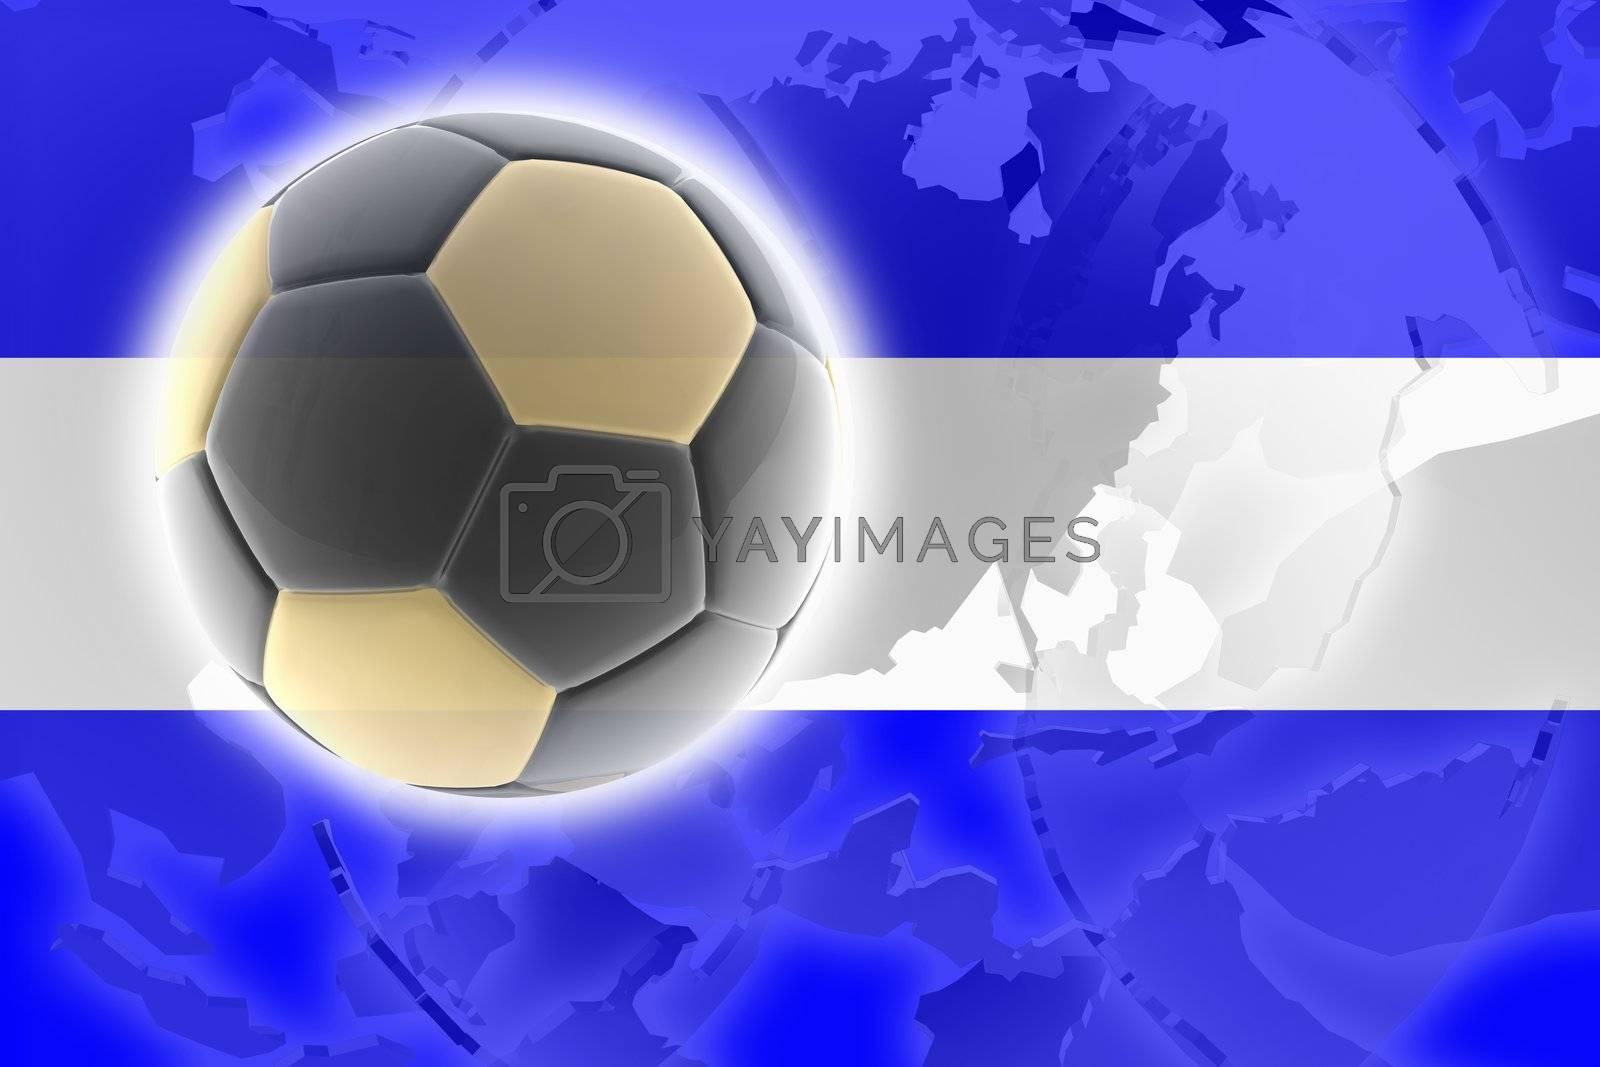 Flag of El Salvador, national country symbol illustration sports soccer football